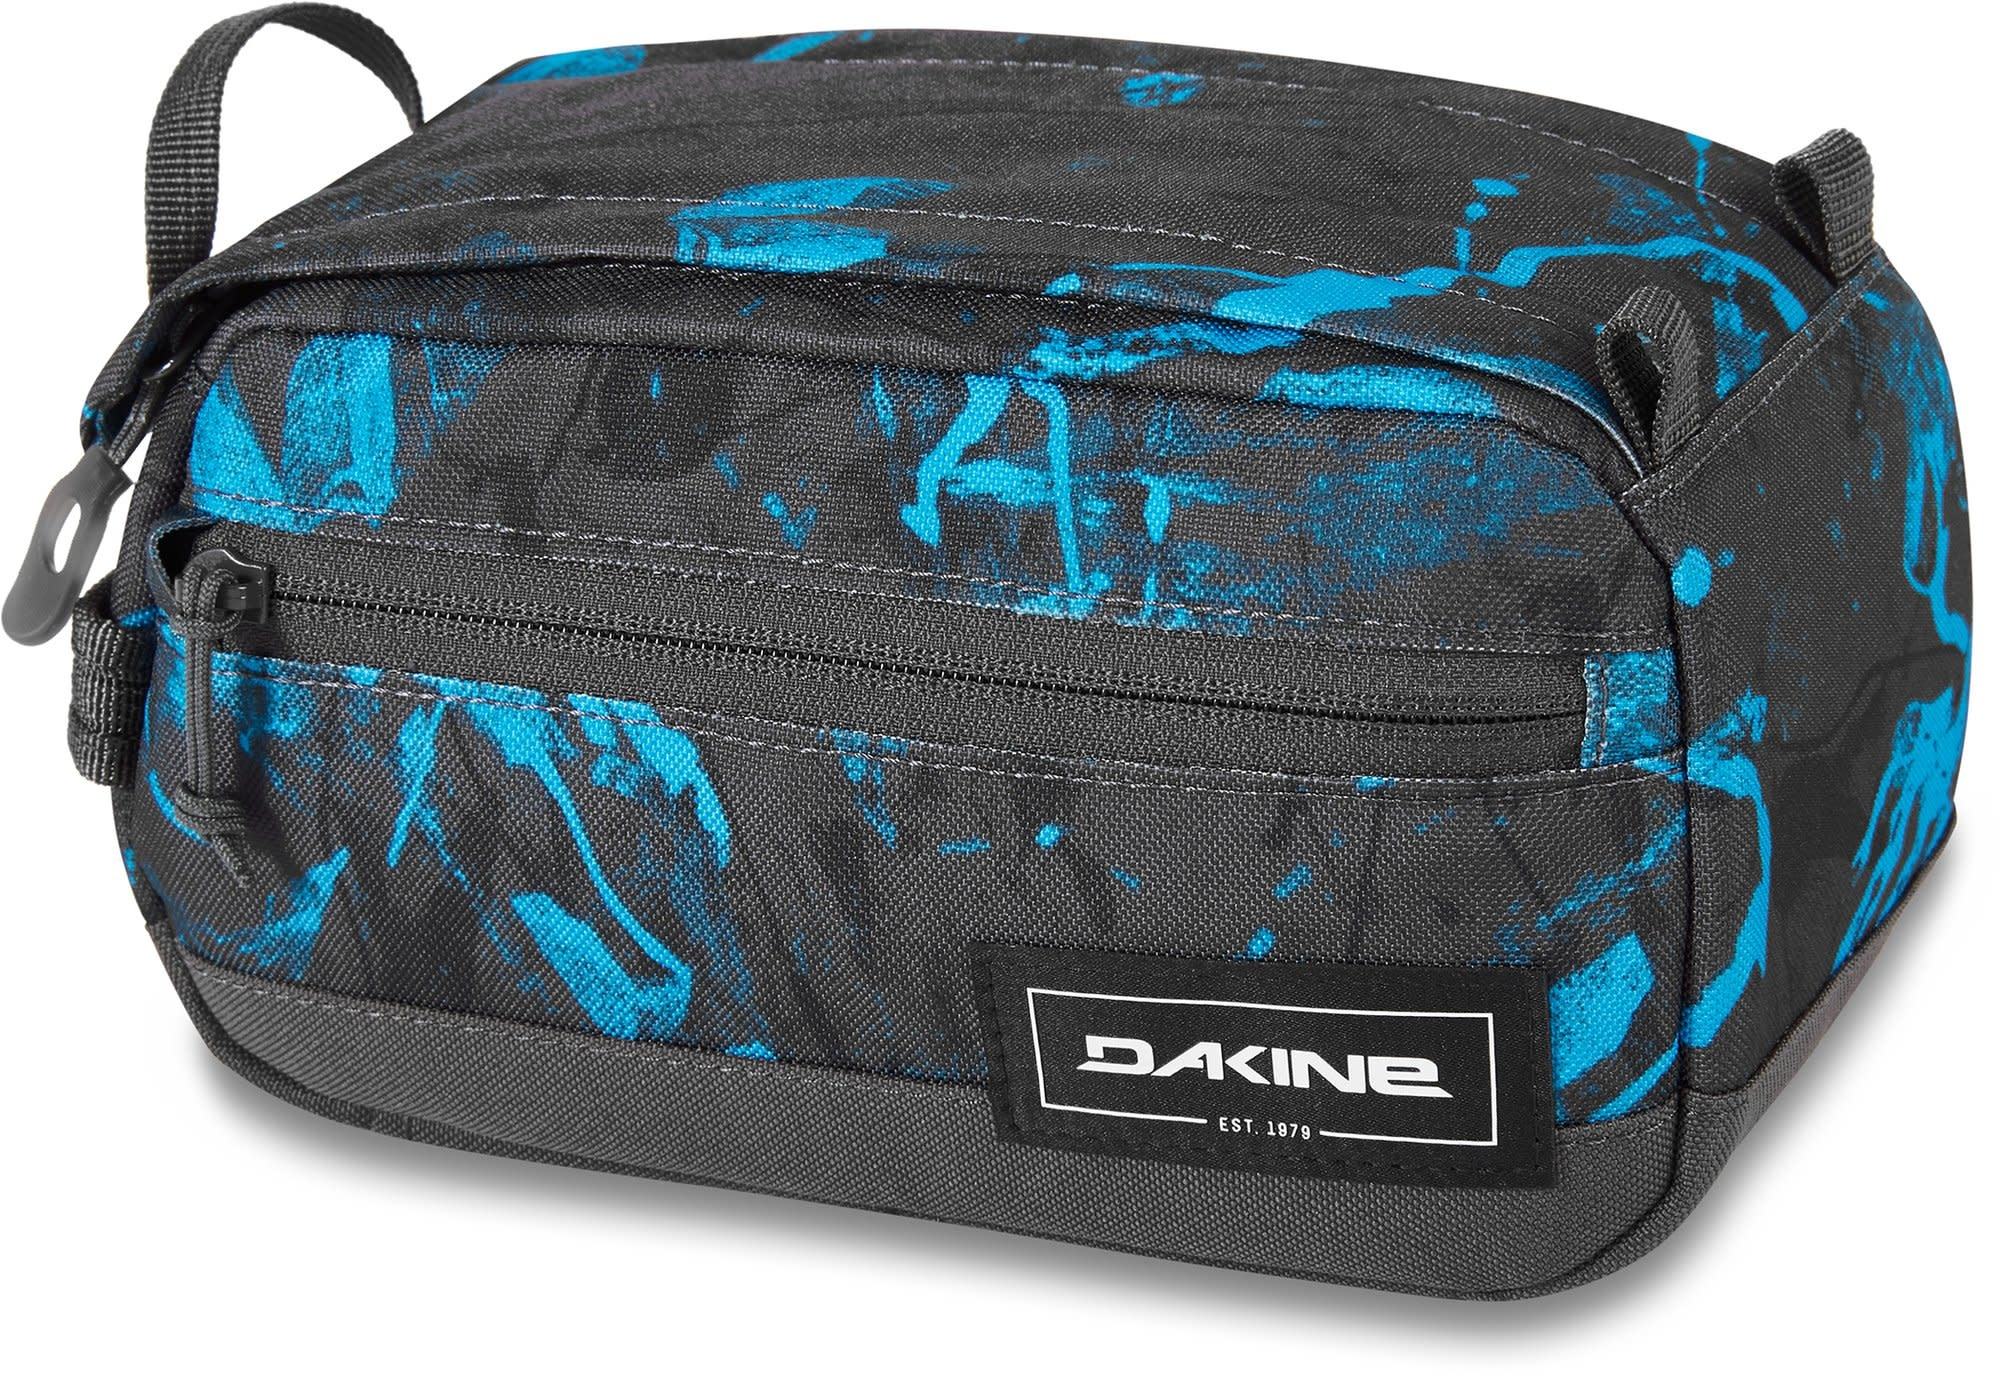 Dakine Dakine Groomer Medium Travel Kit